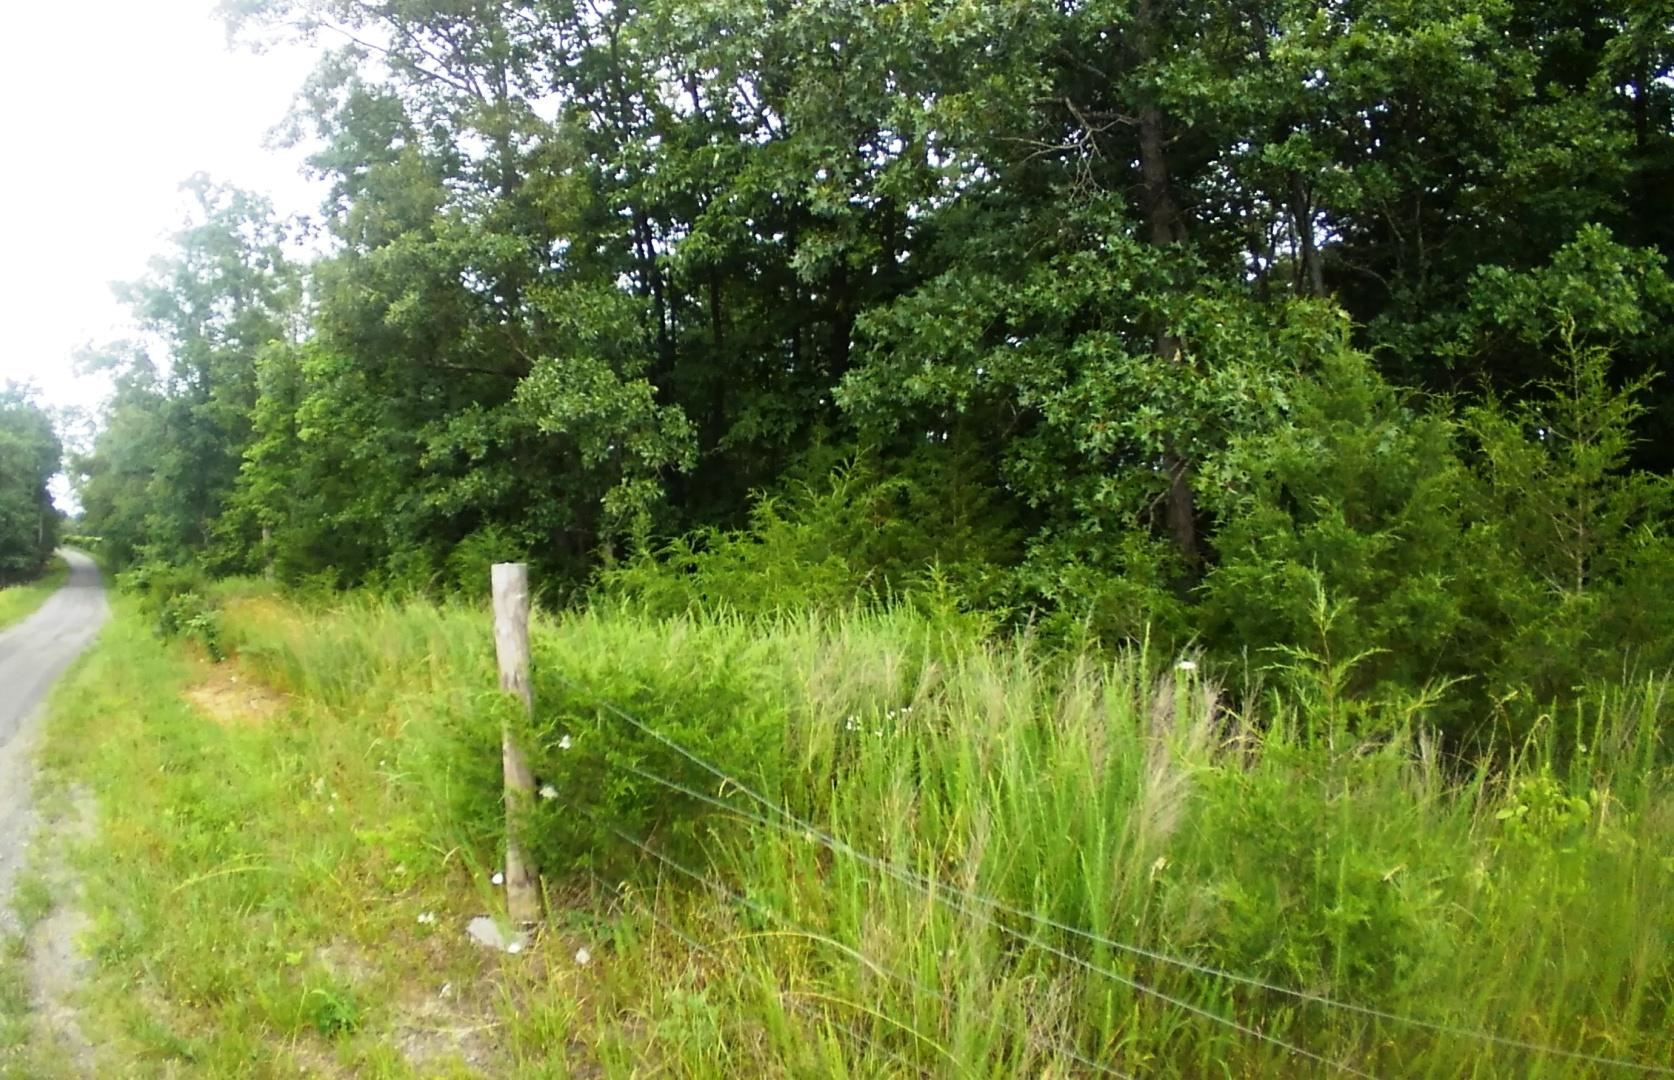 Photo of Lot 8 Smelcer Road, Mosheim, TN 37810 (MLS # 267361)